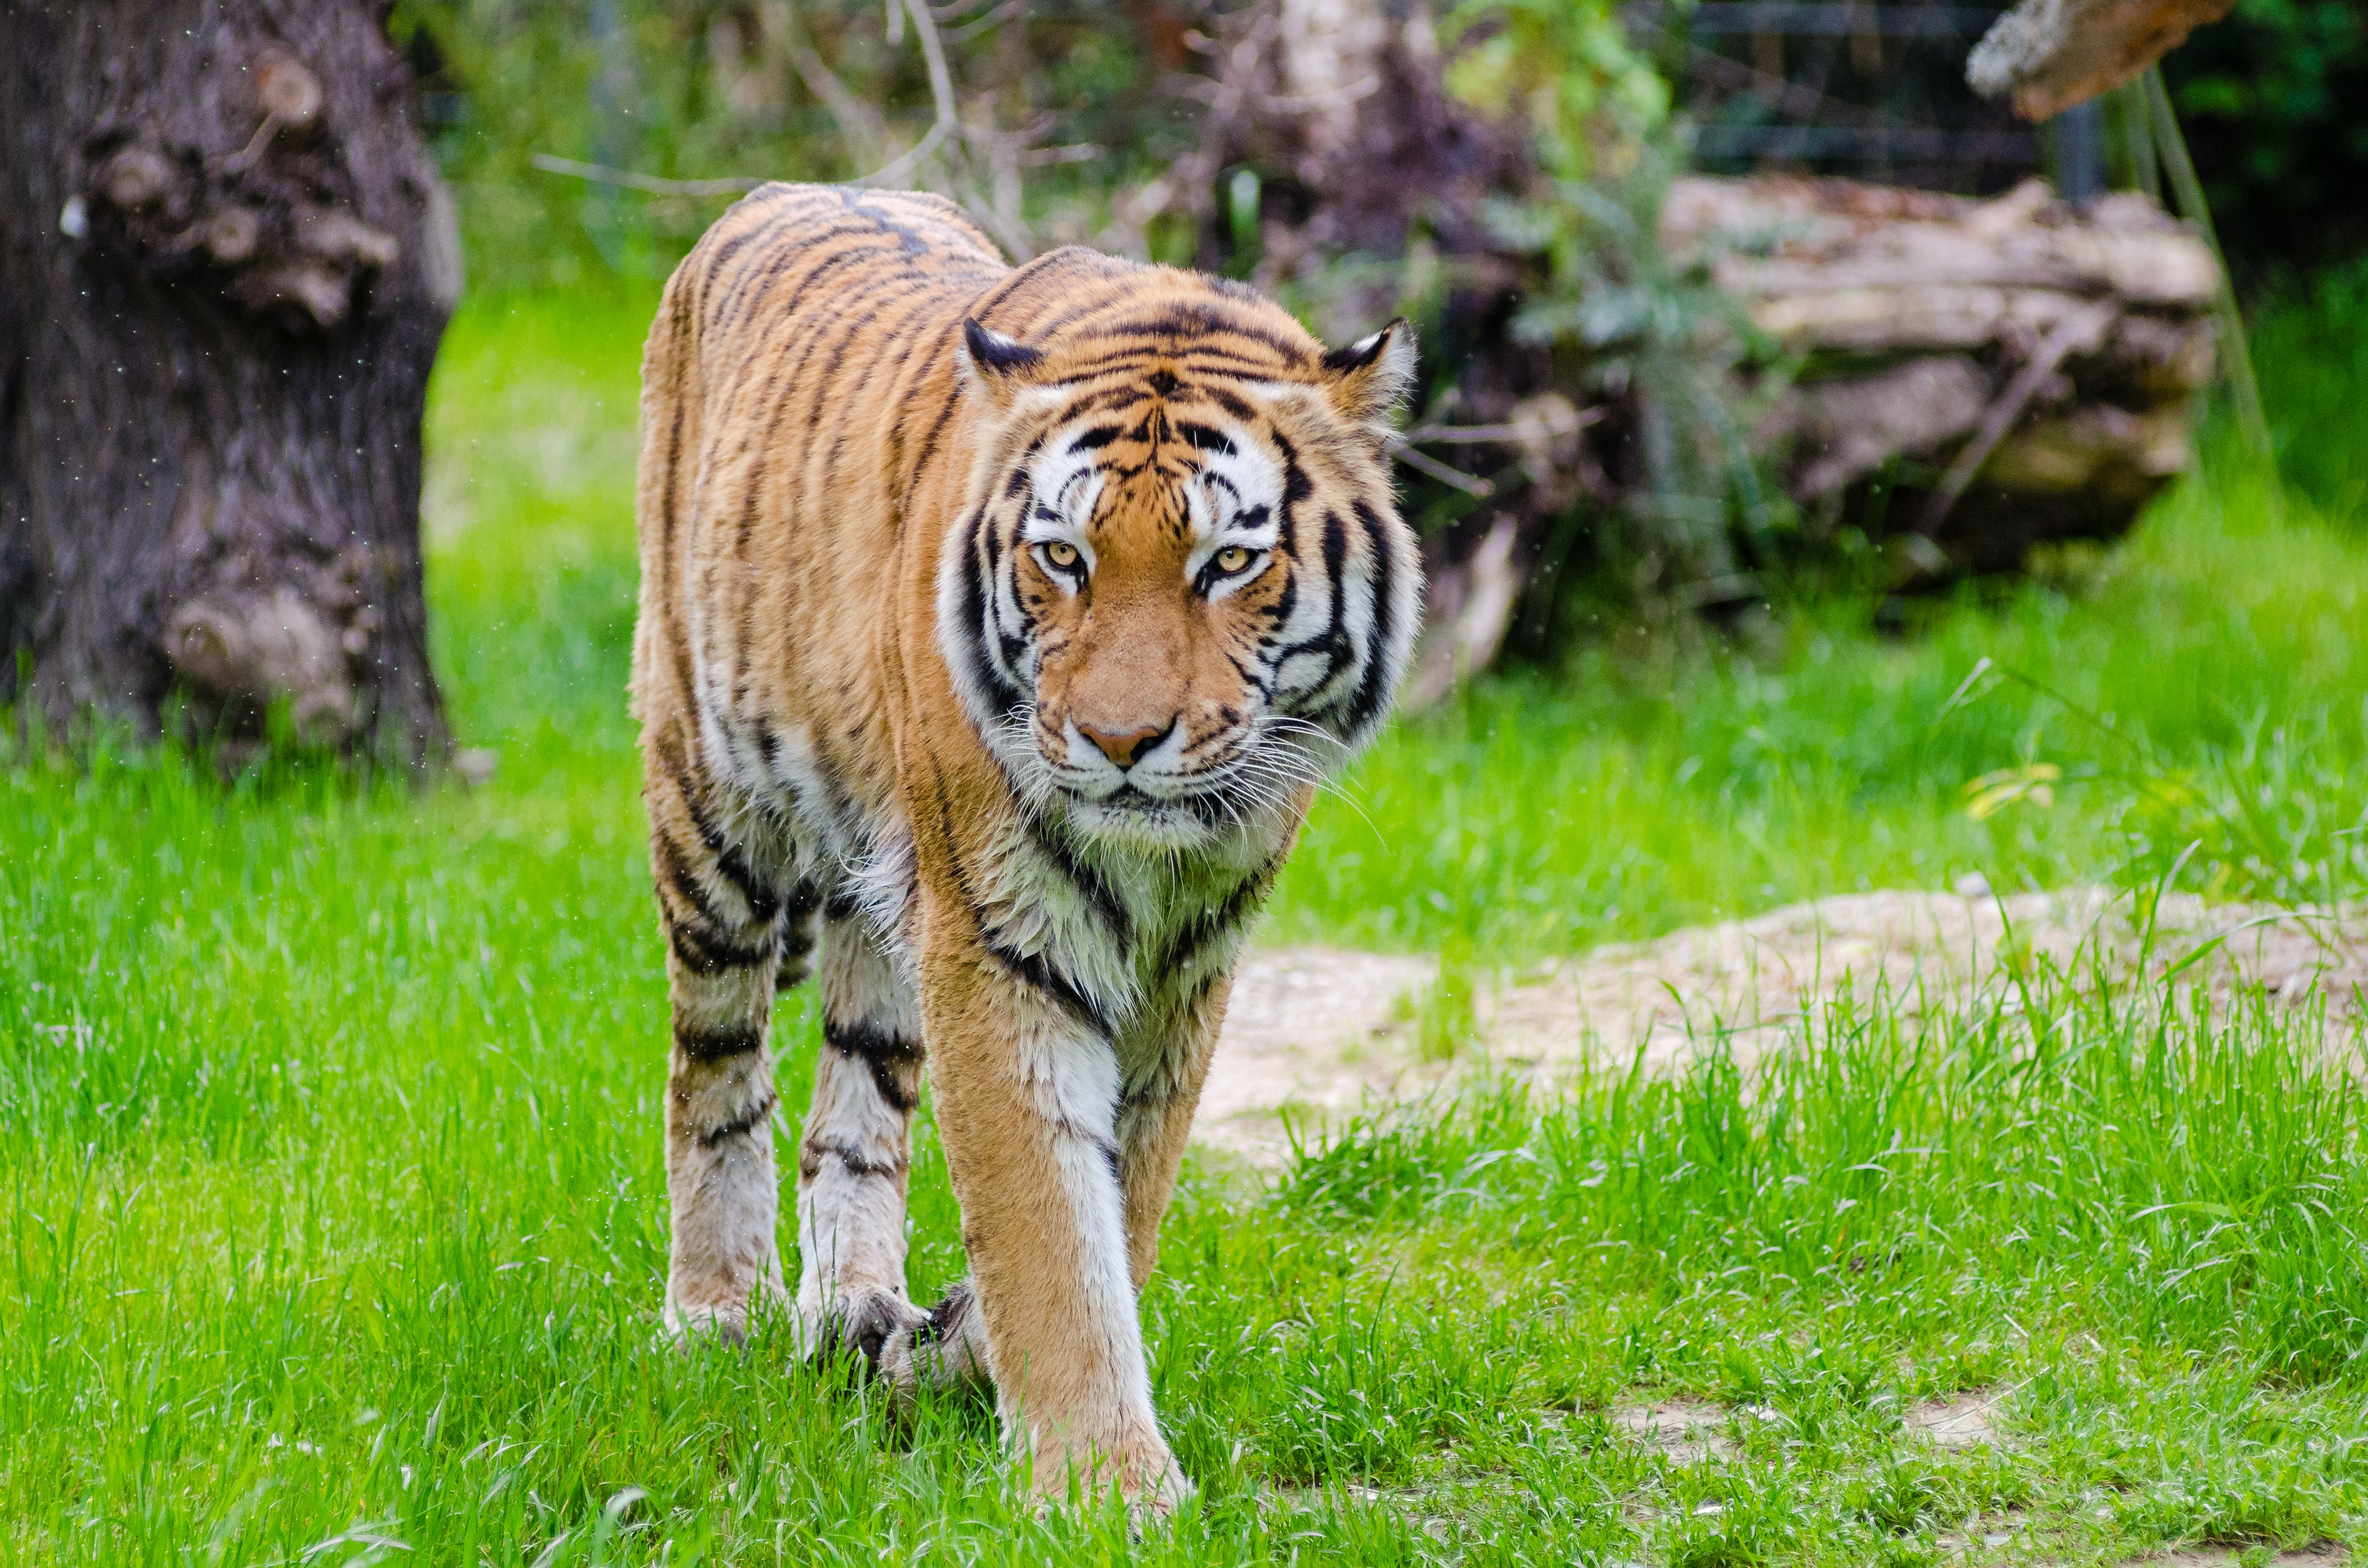 orange and black bengal tiger walking on green grass field during